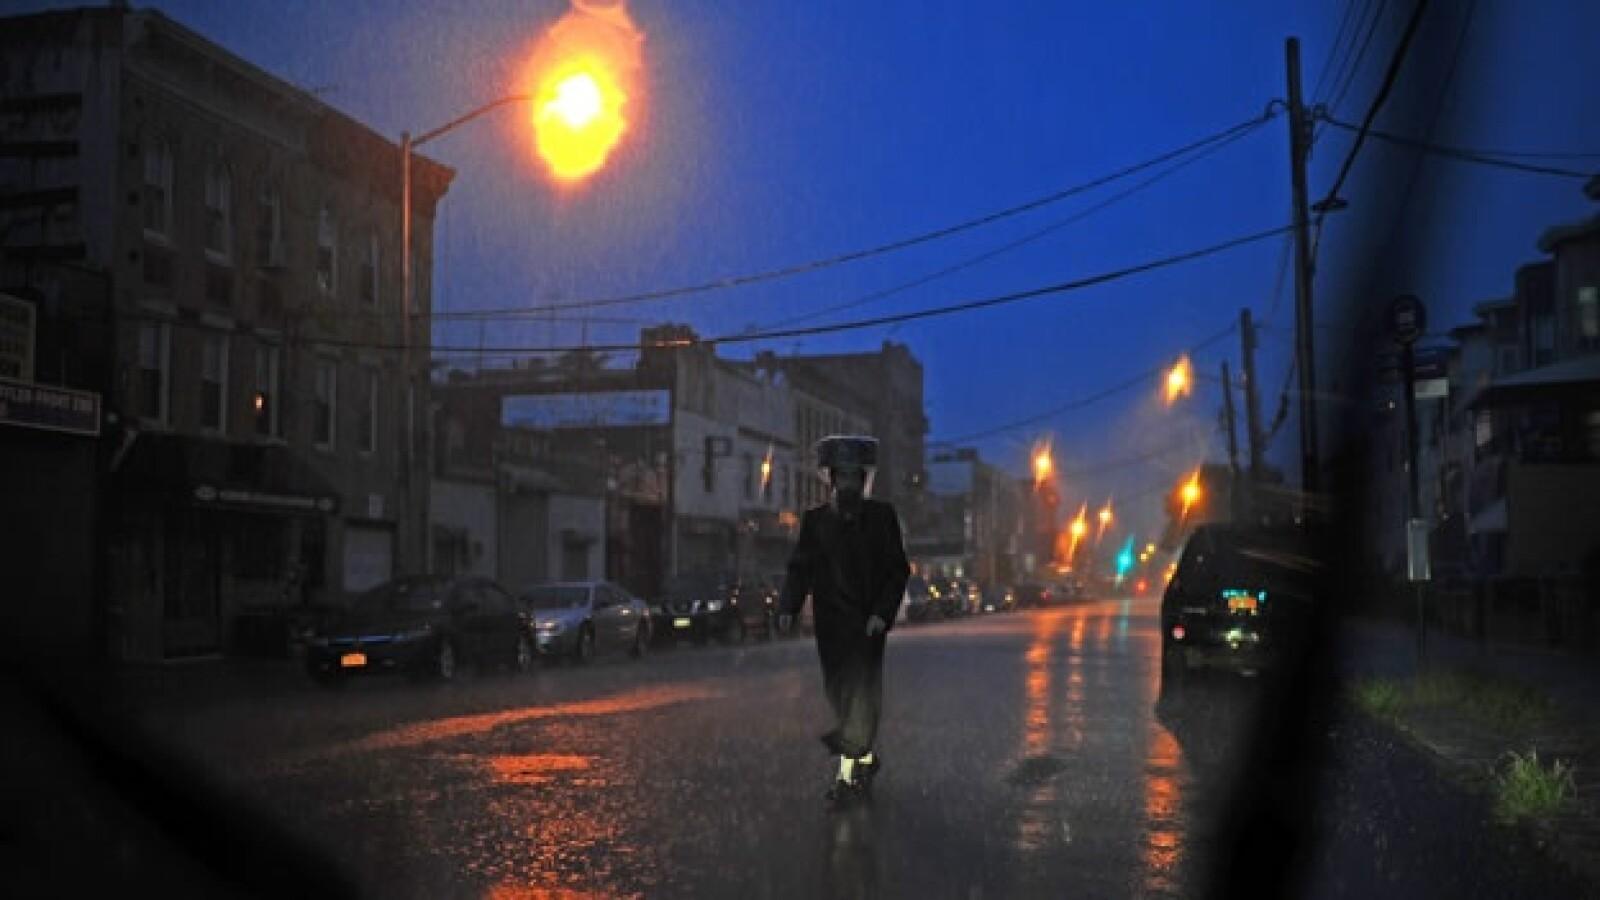 Calles Nueva York Irene